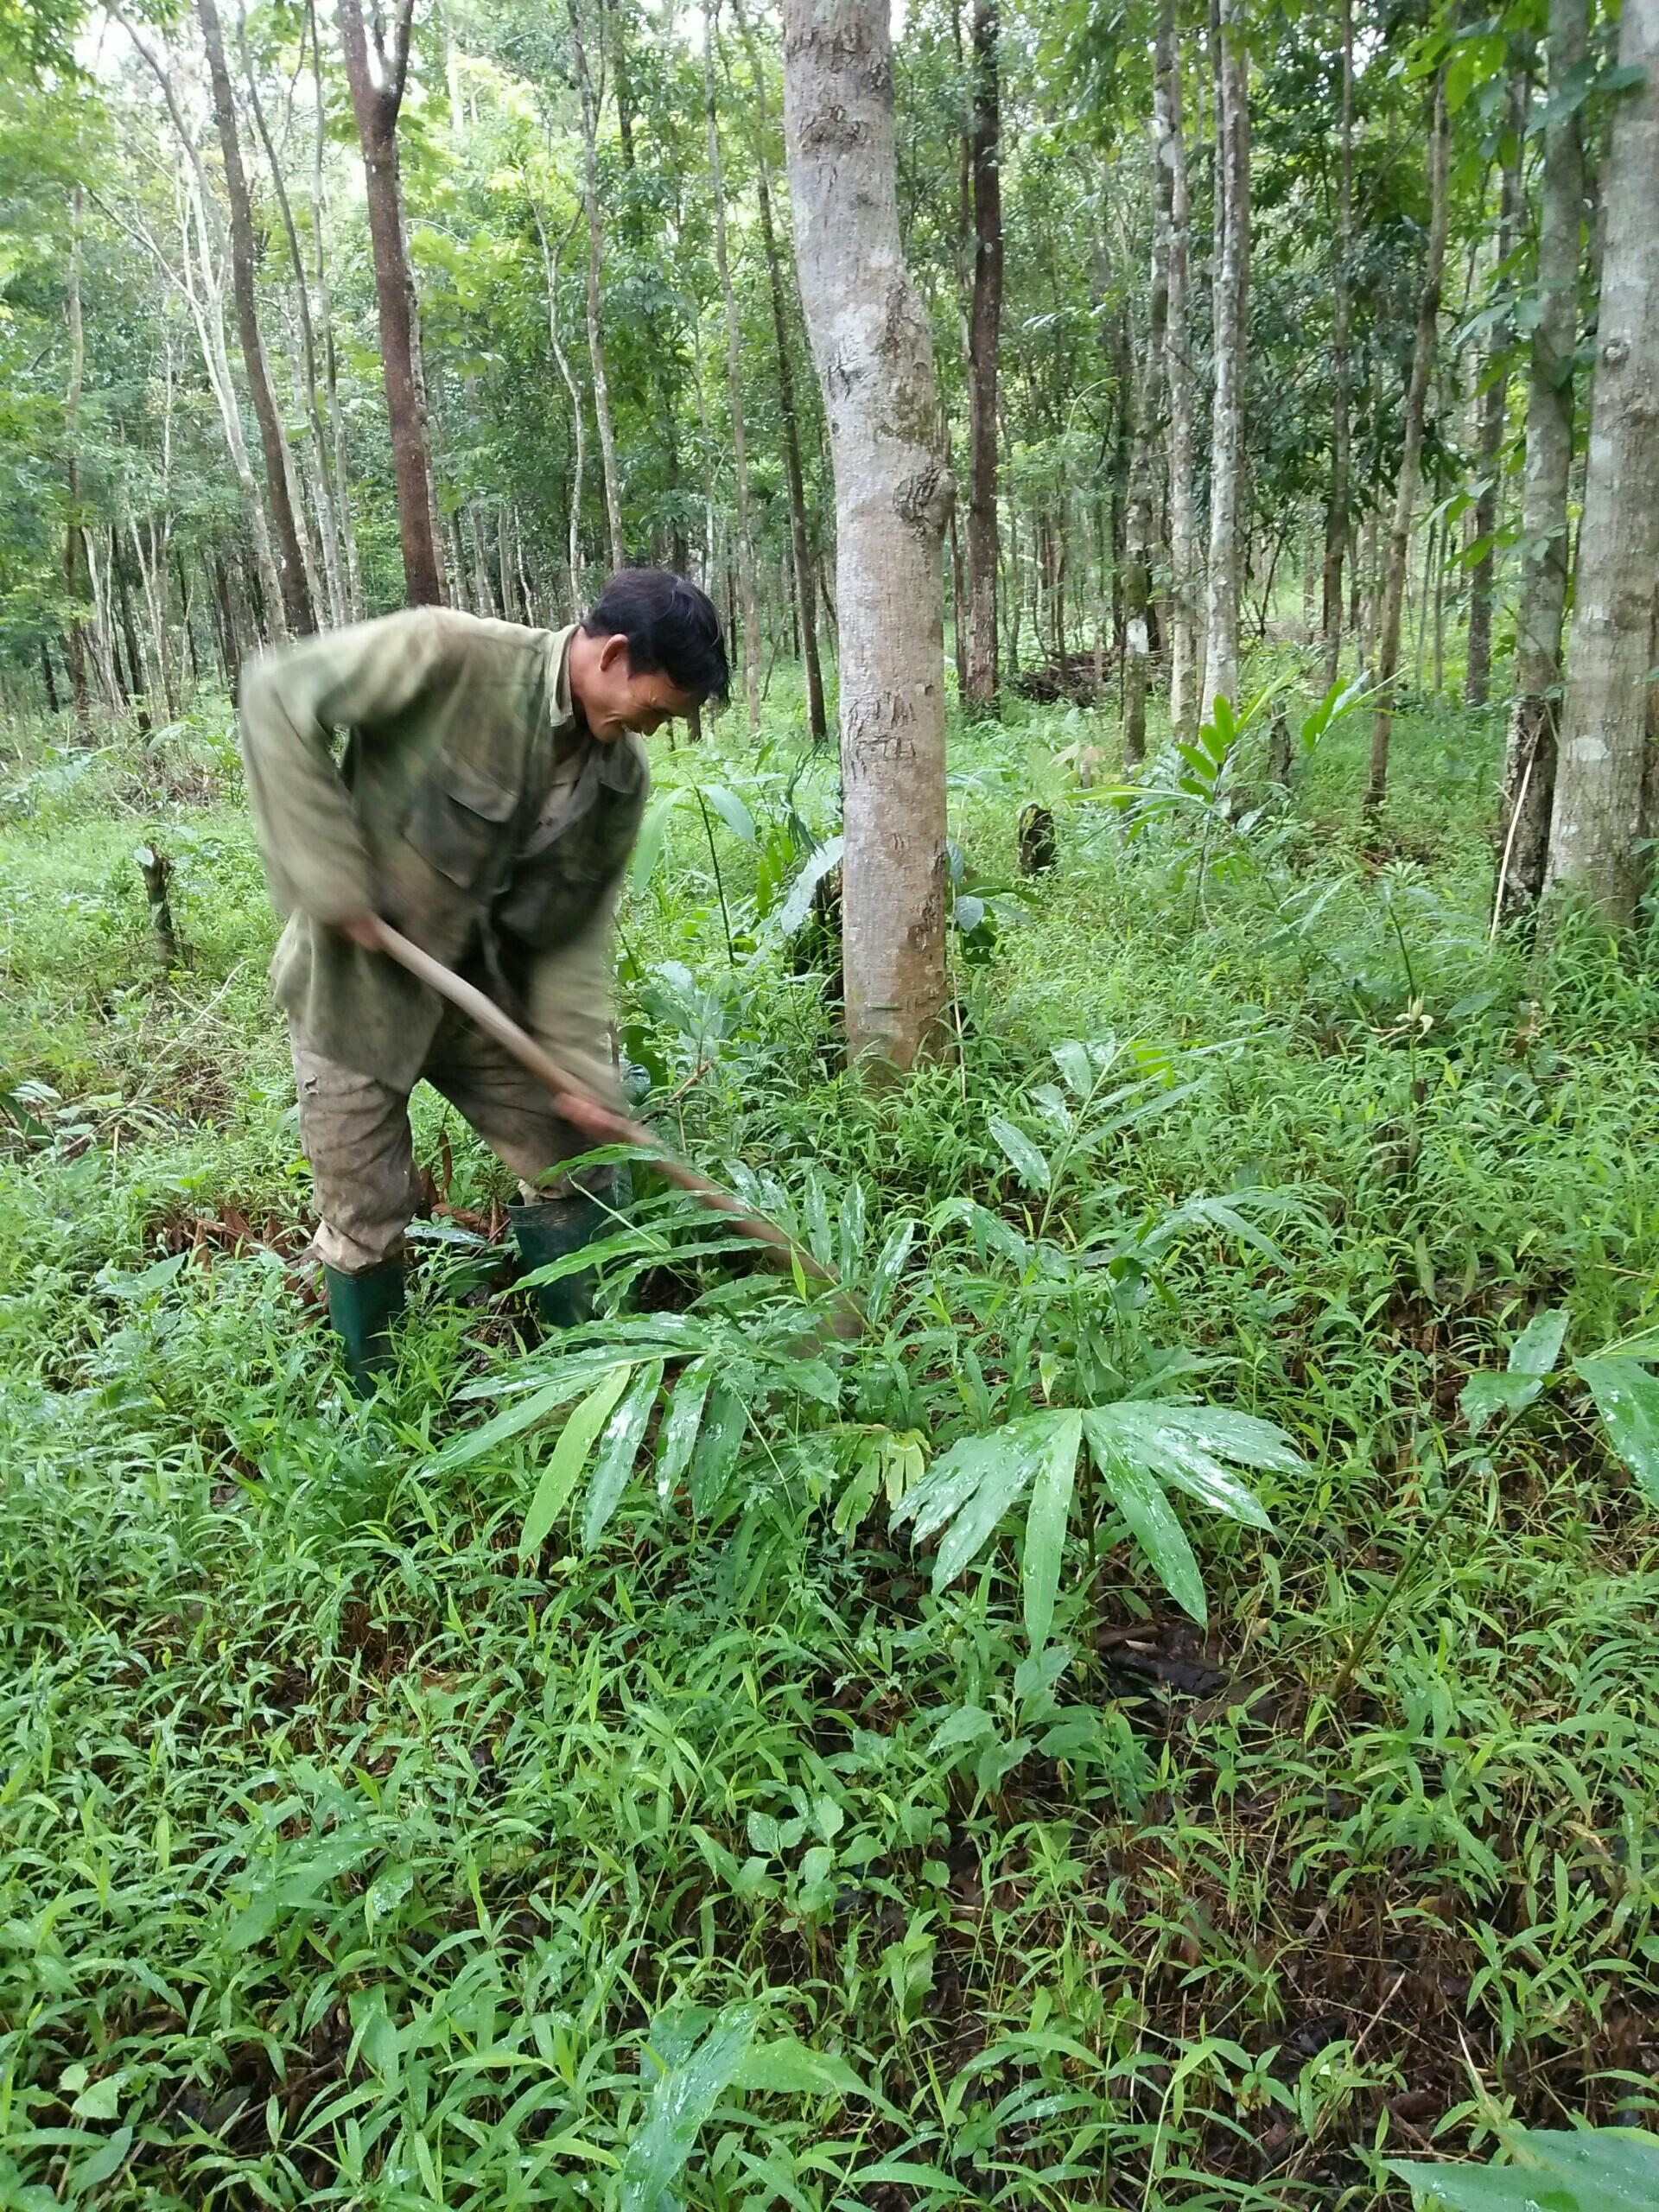 Amomum longiligulare – a sustainable livelihood model